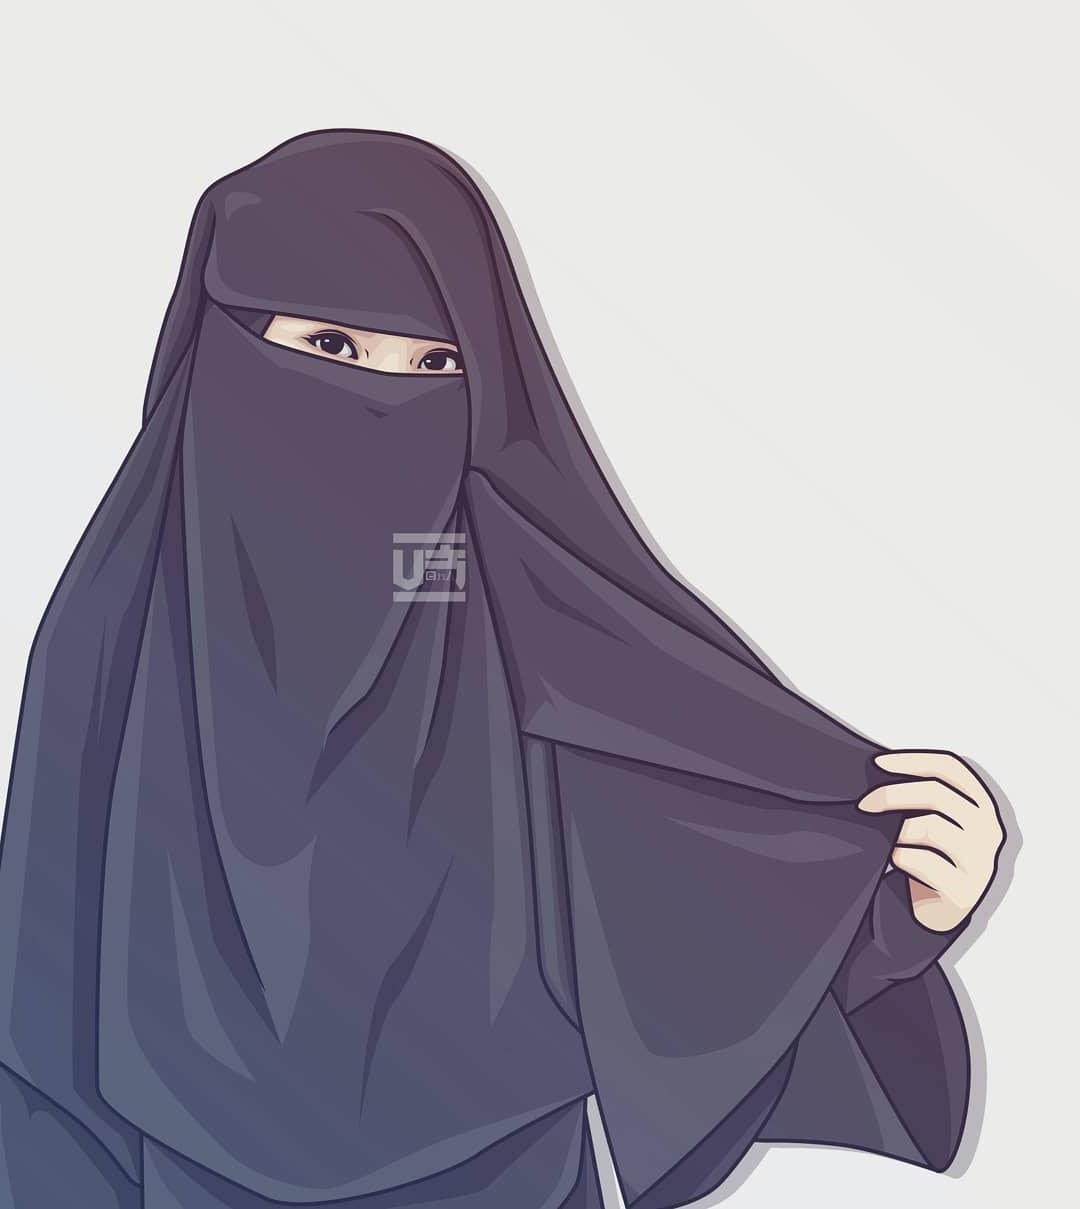 Design Muslimah Bercadar Kartun Zwd9 Menakjubkan 30 Gambar Kartun Muslimah Bercadar Berkacamata